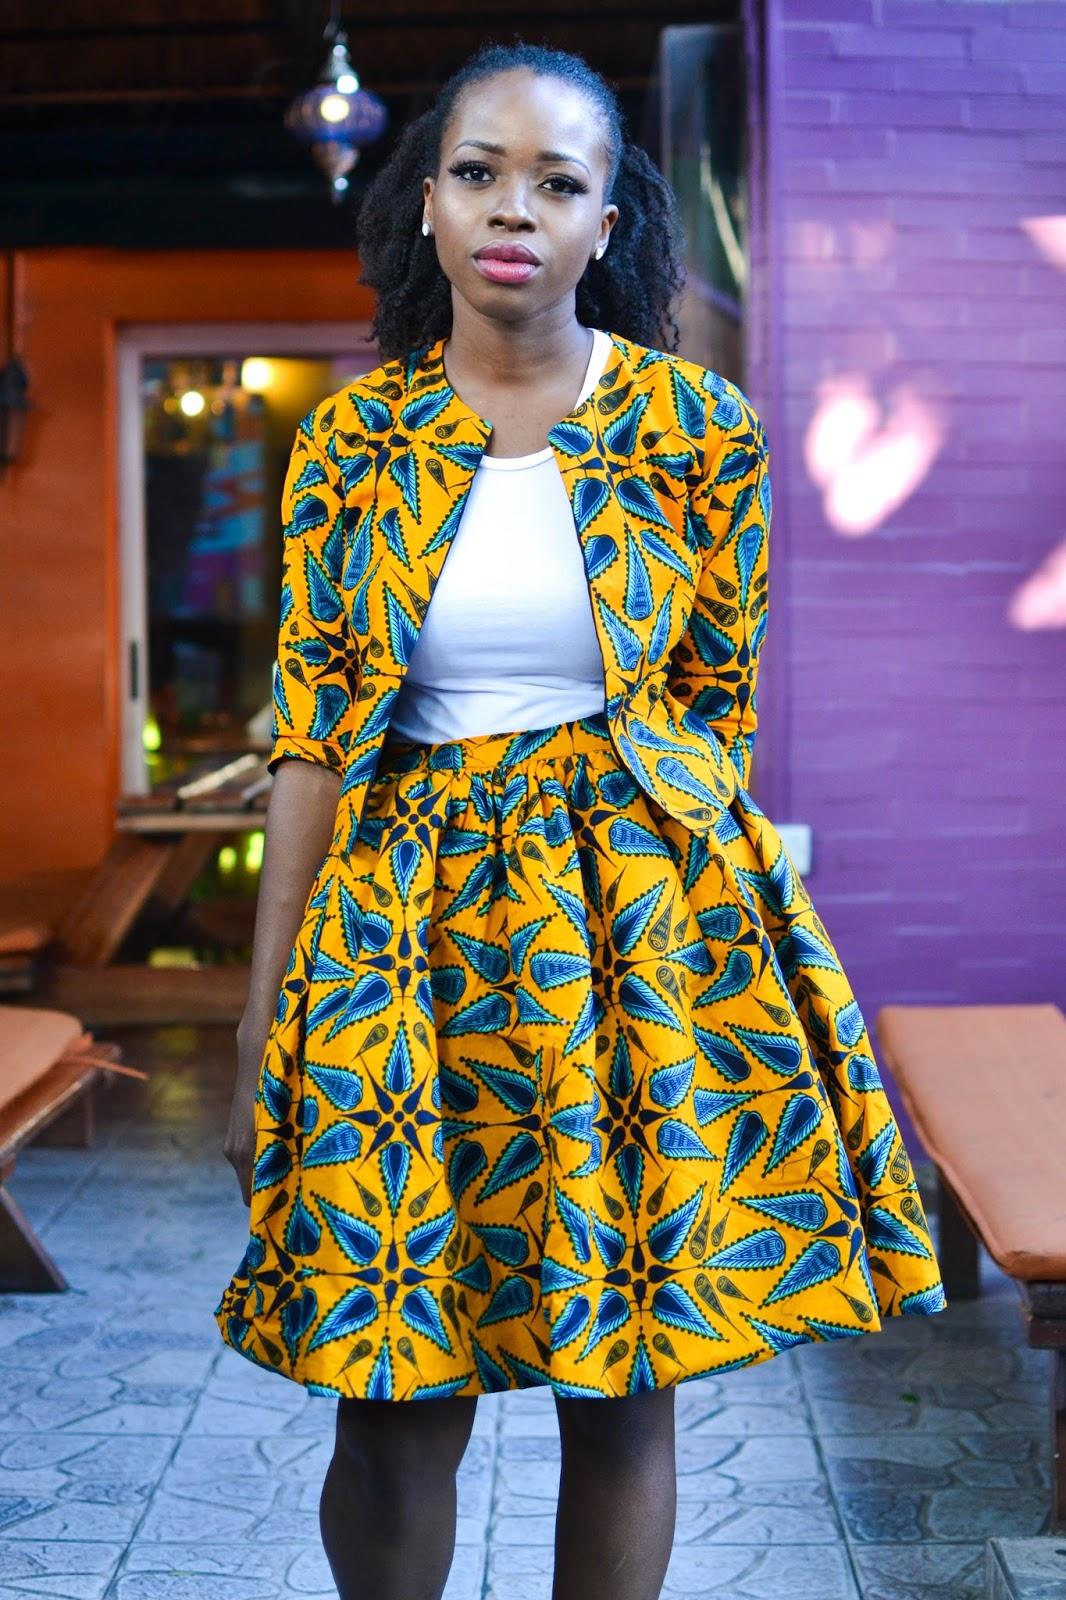 African Fashion Blogger looking fierce